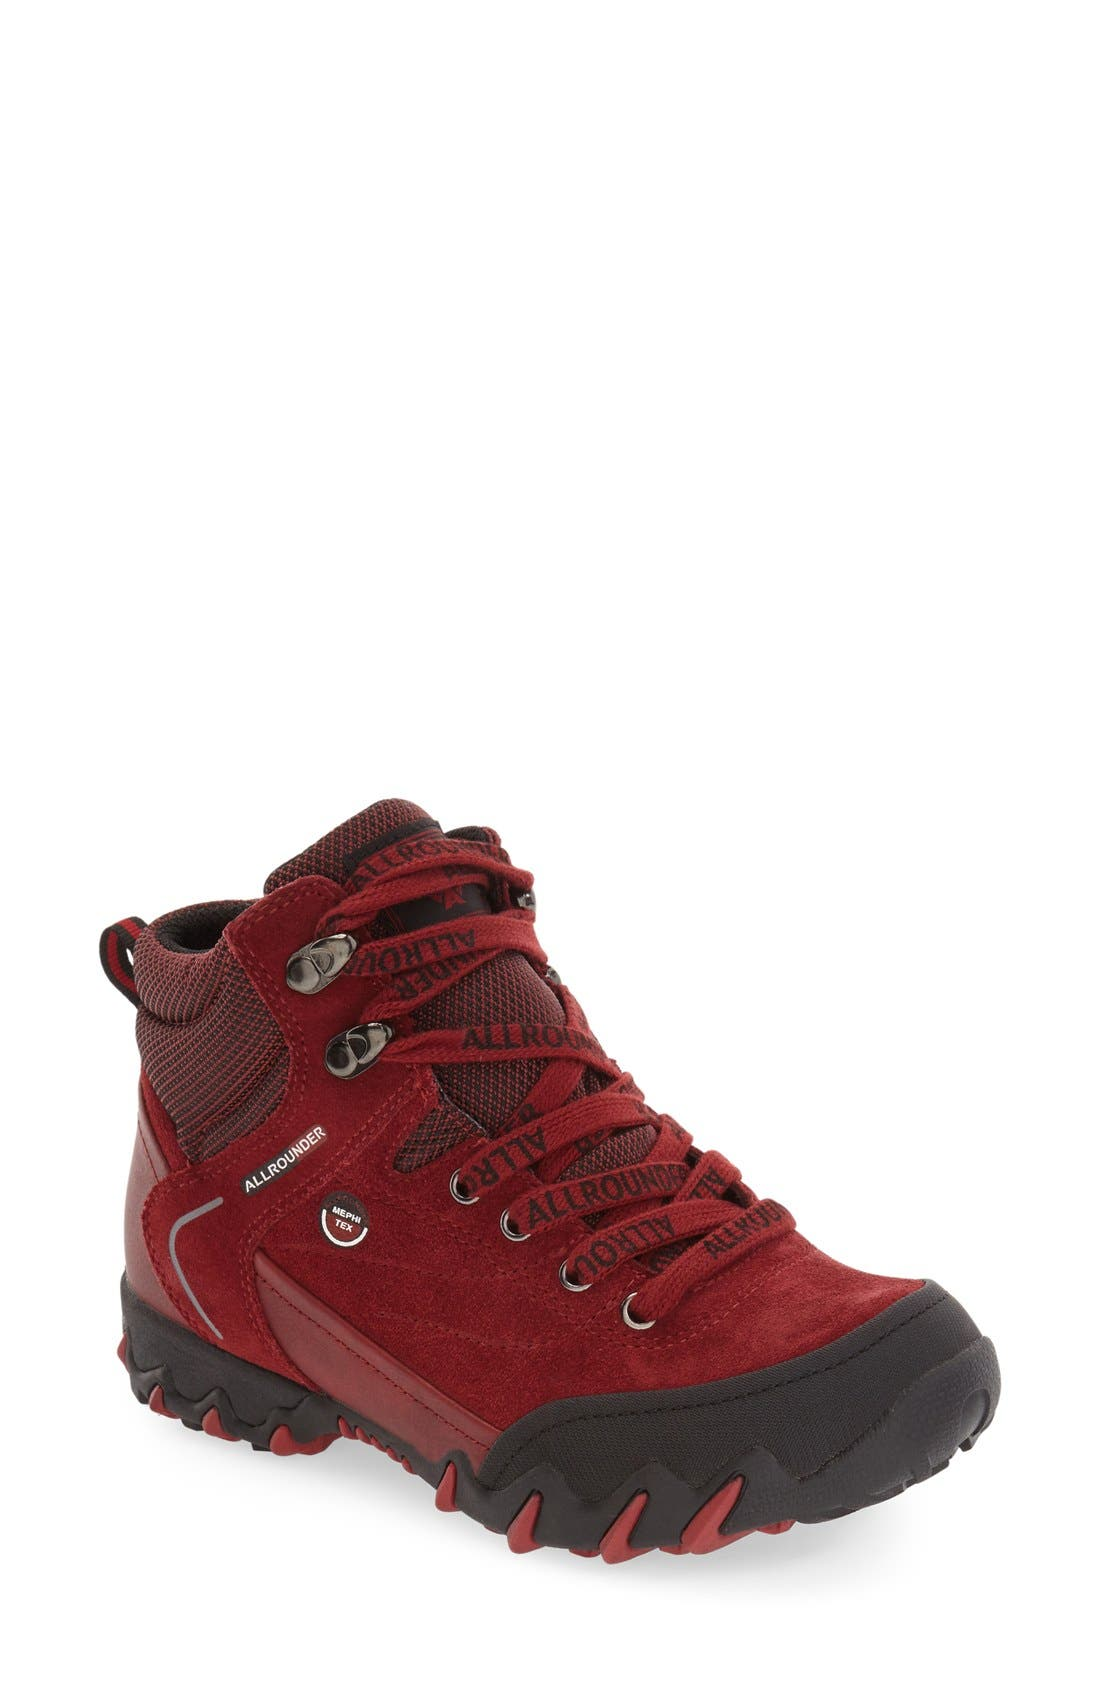 Alternate Image 1 Selected - Allrounder by Mephisto 'Nigata-Tex' Waterproof Sneaker (Women)